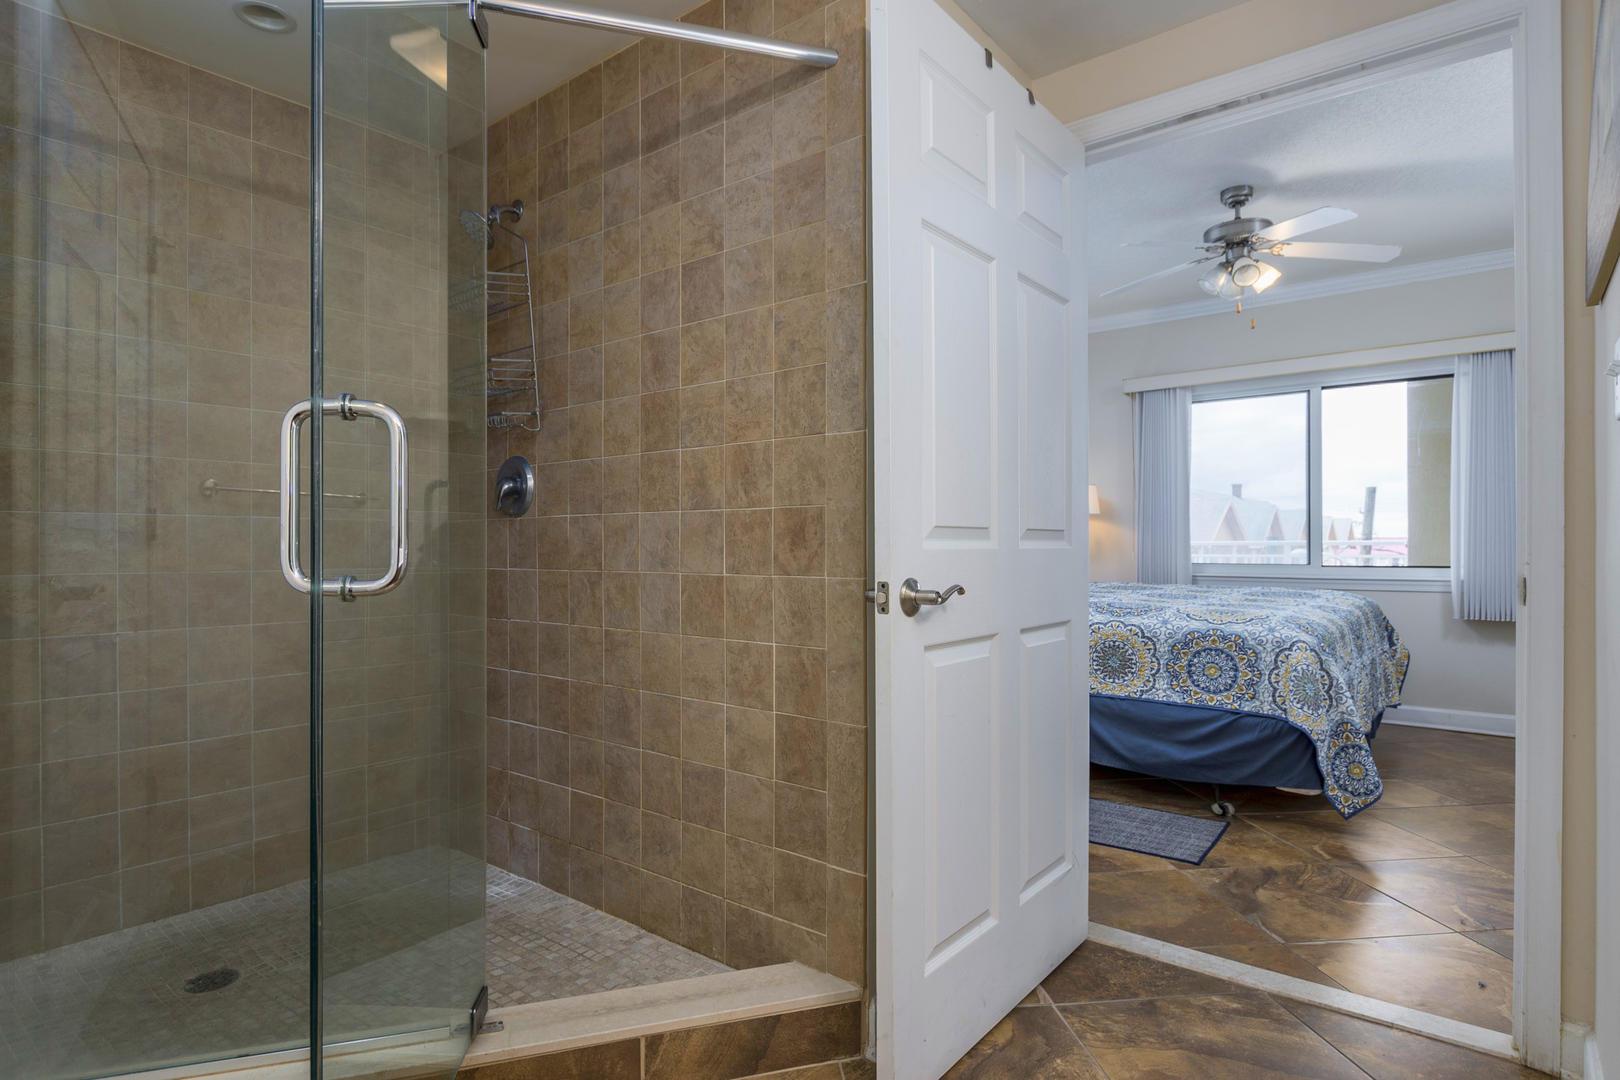 Oceans Mist 301 - Bathroom 2